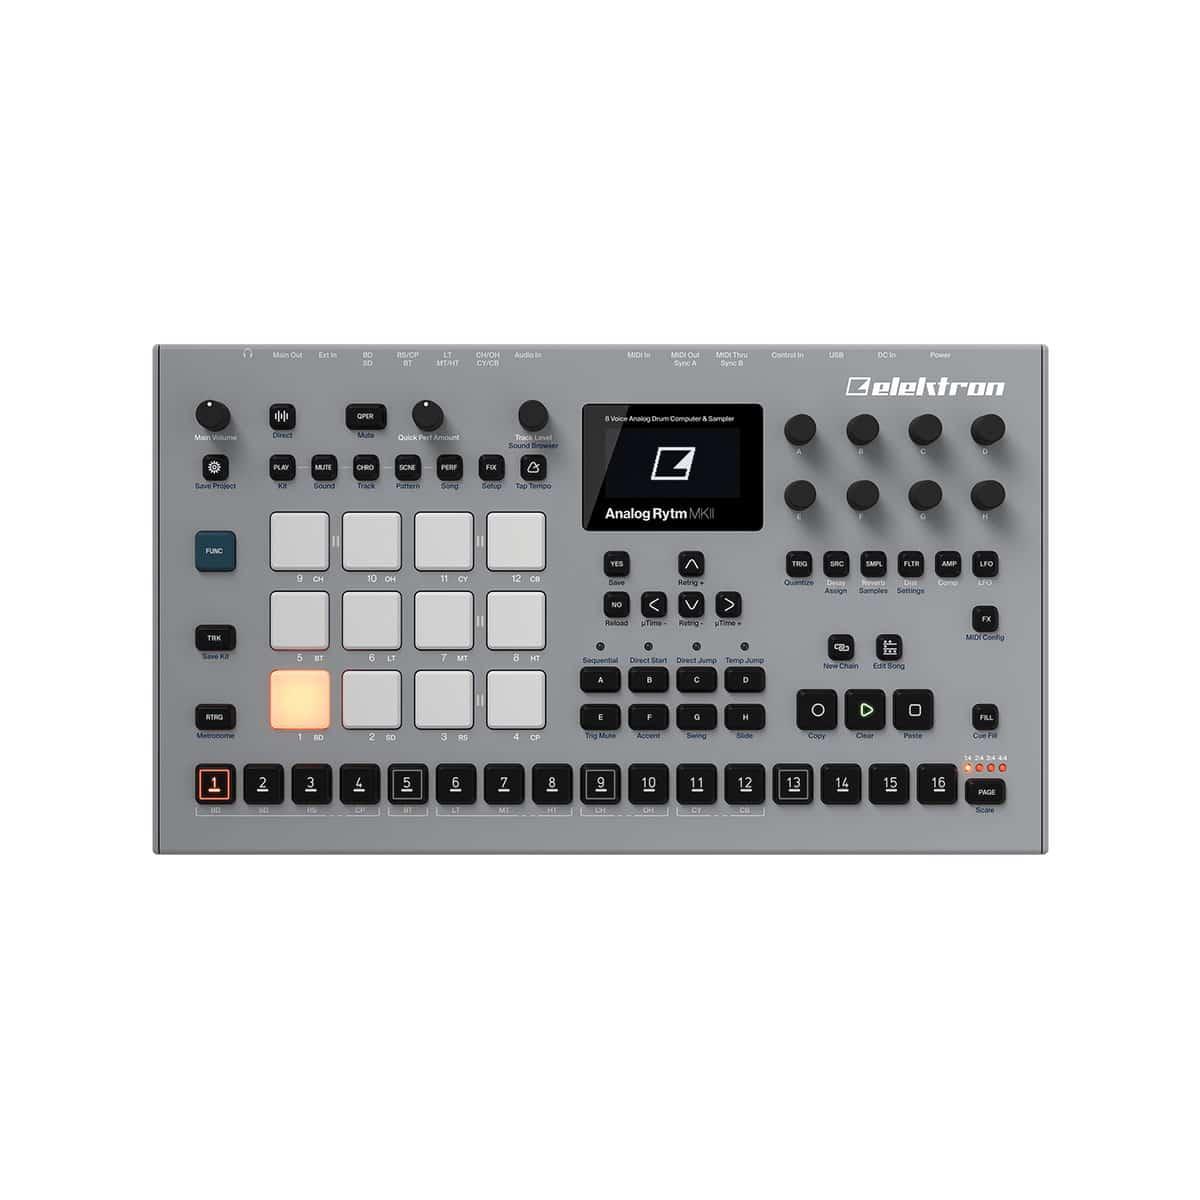 Elektron Analog Rytm MKII 04 Sintetizzatori e Drum Machine, Drum Machines Batterie Elettroniche